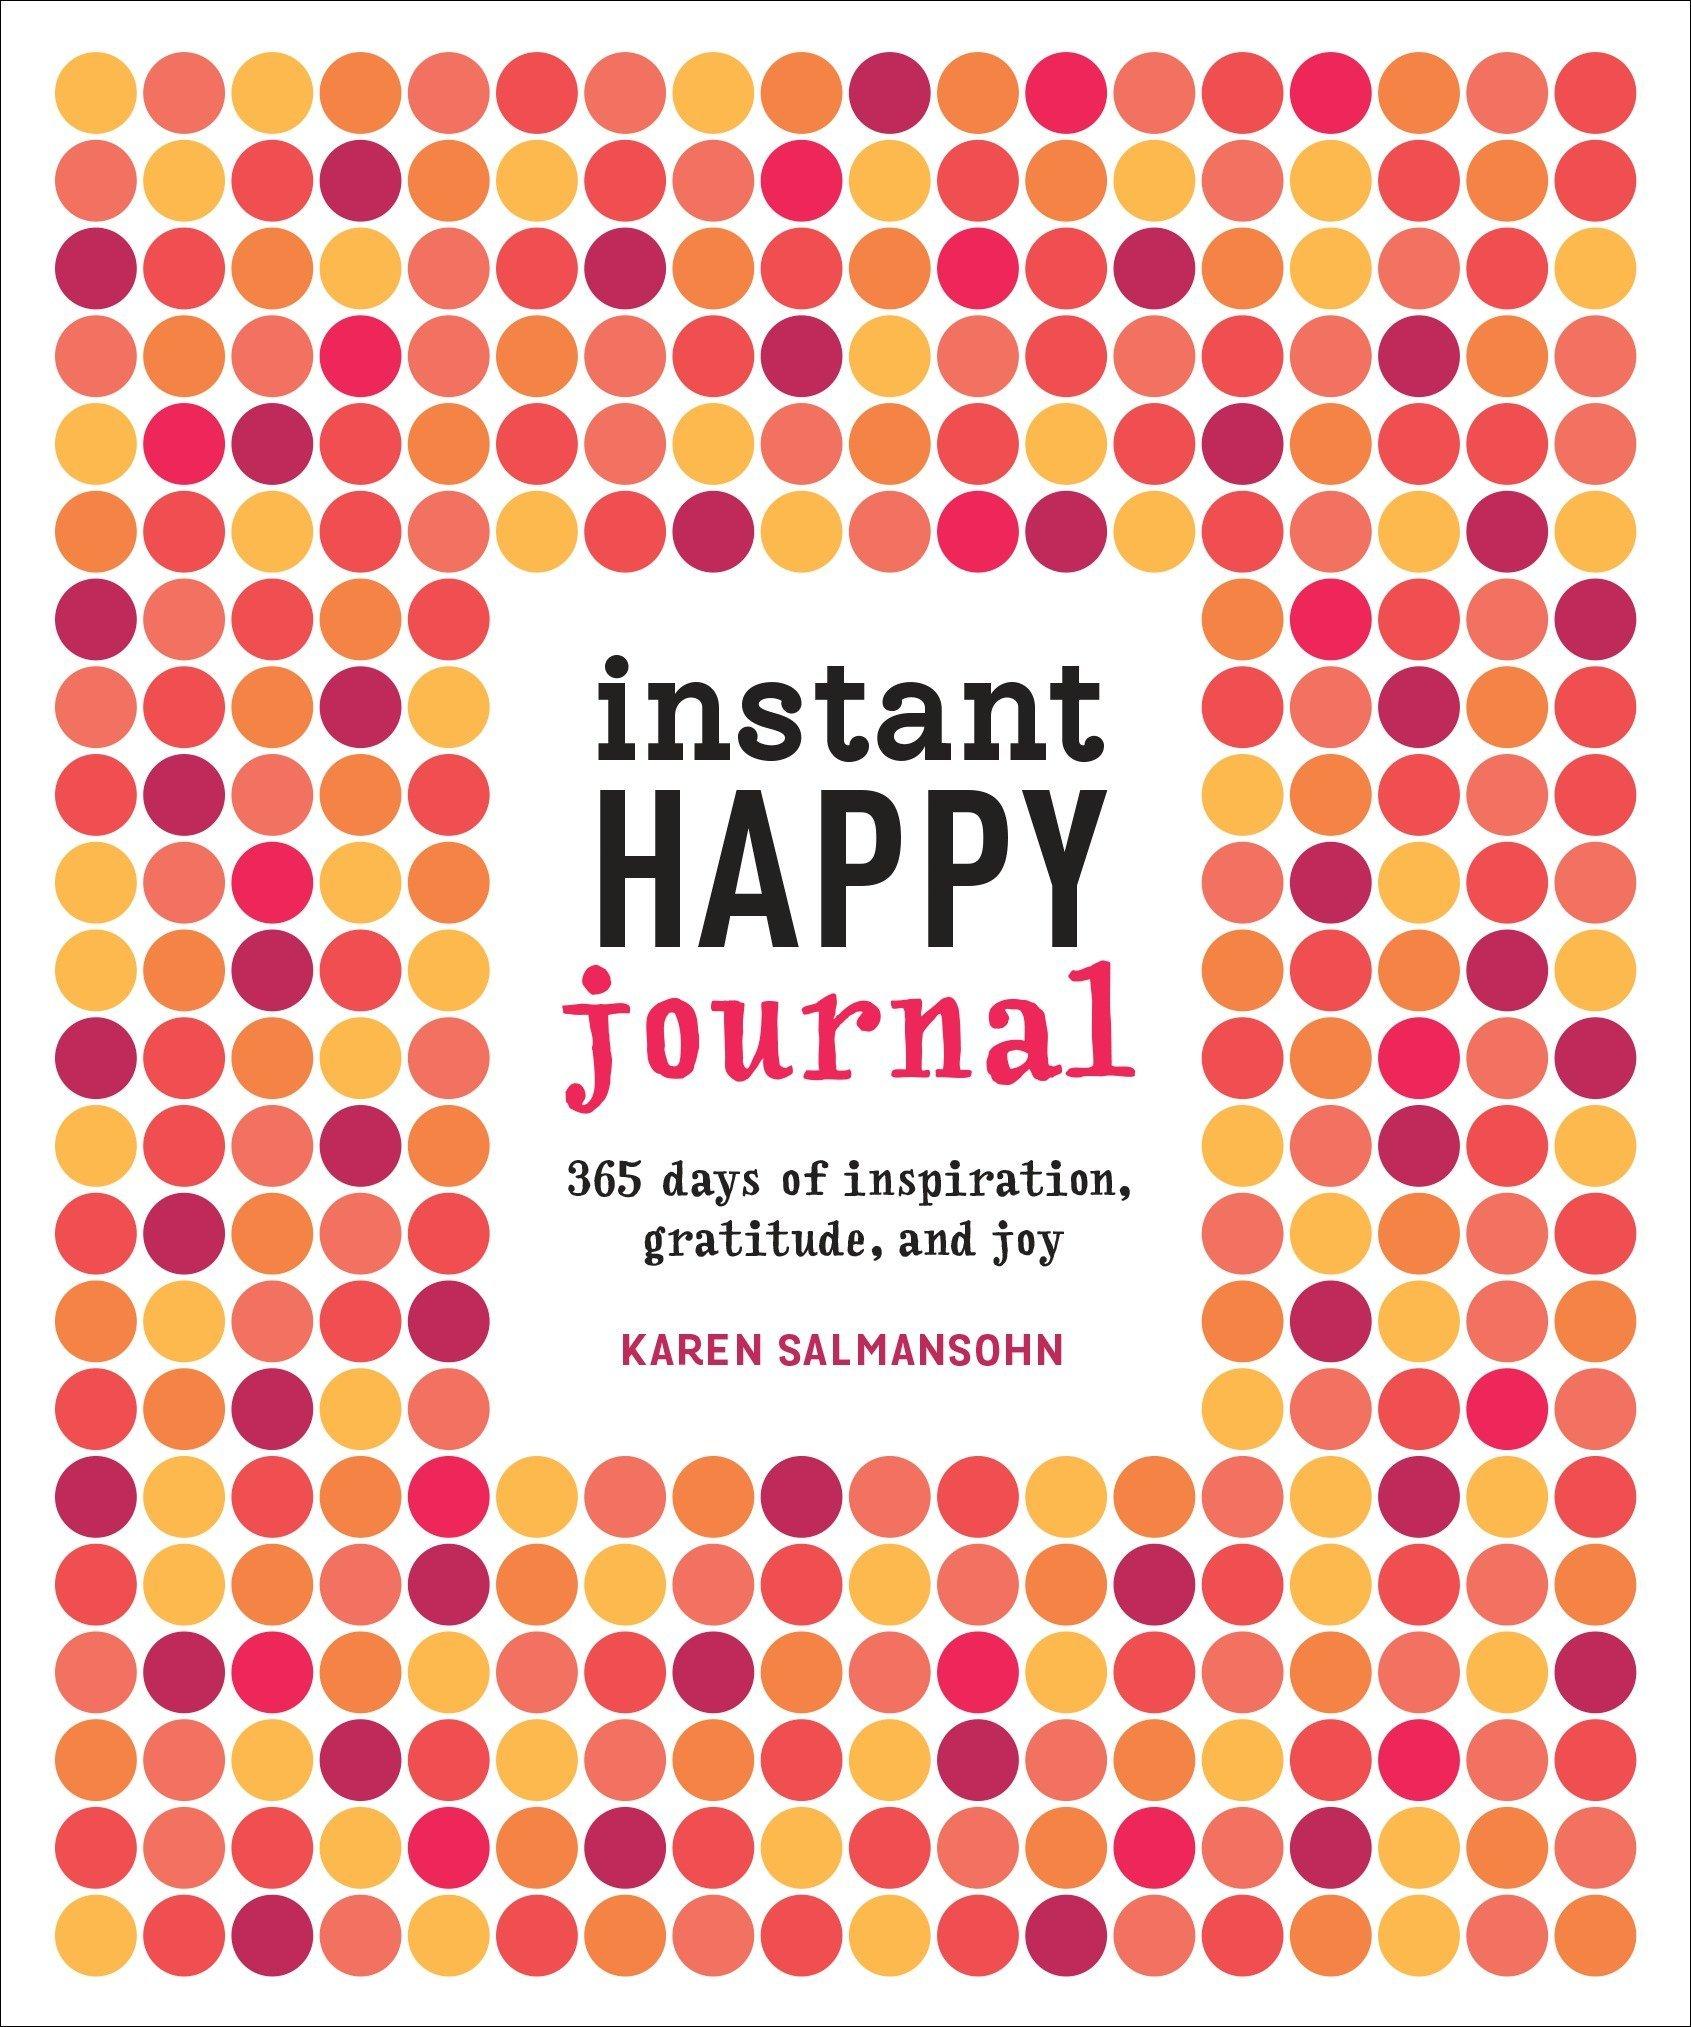 Instant Happy Journal: 365 Days of Inspiration, Gratitude, and Joy: Karen  Salmansohn: 9781607748243: Amazon.com: Books